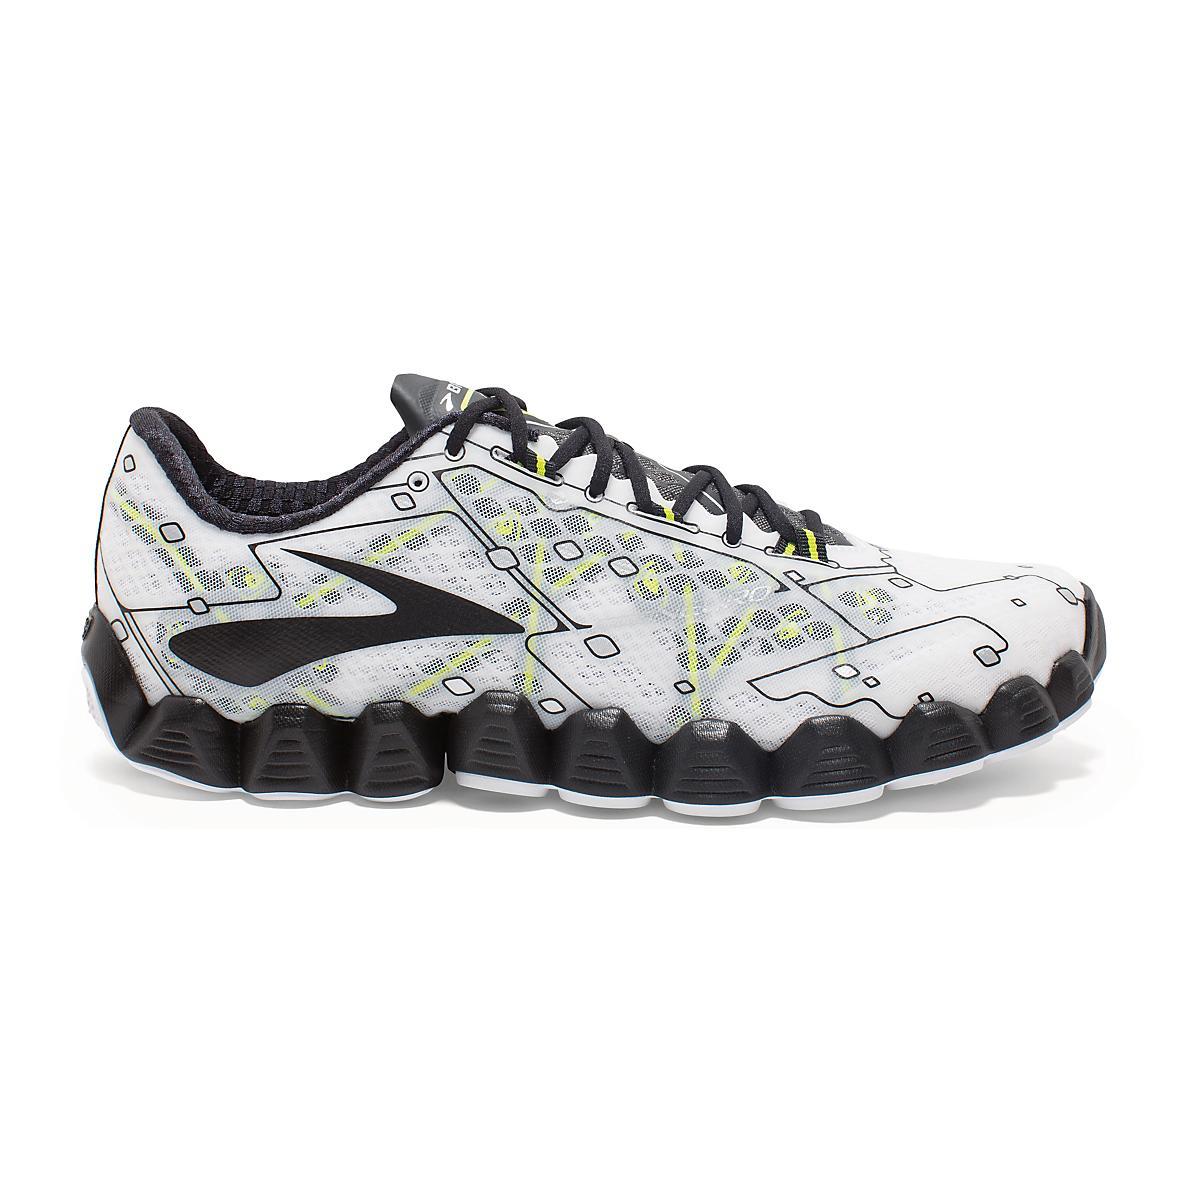 8df675965b9 Mens Brooks Neuro Running Shoe at Road Runner Sports